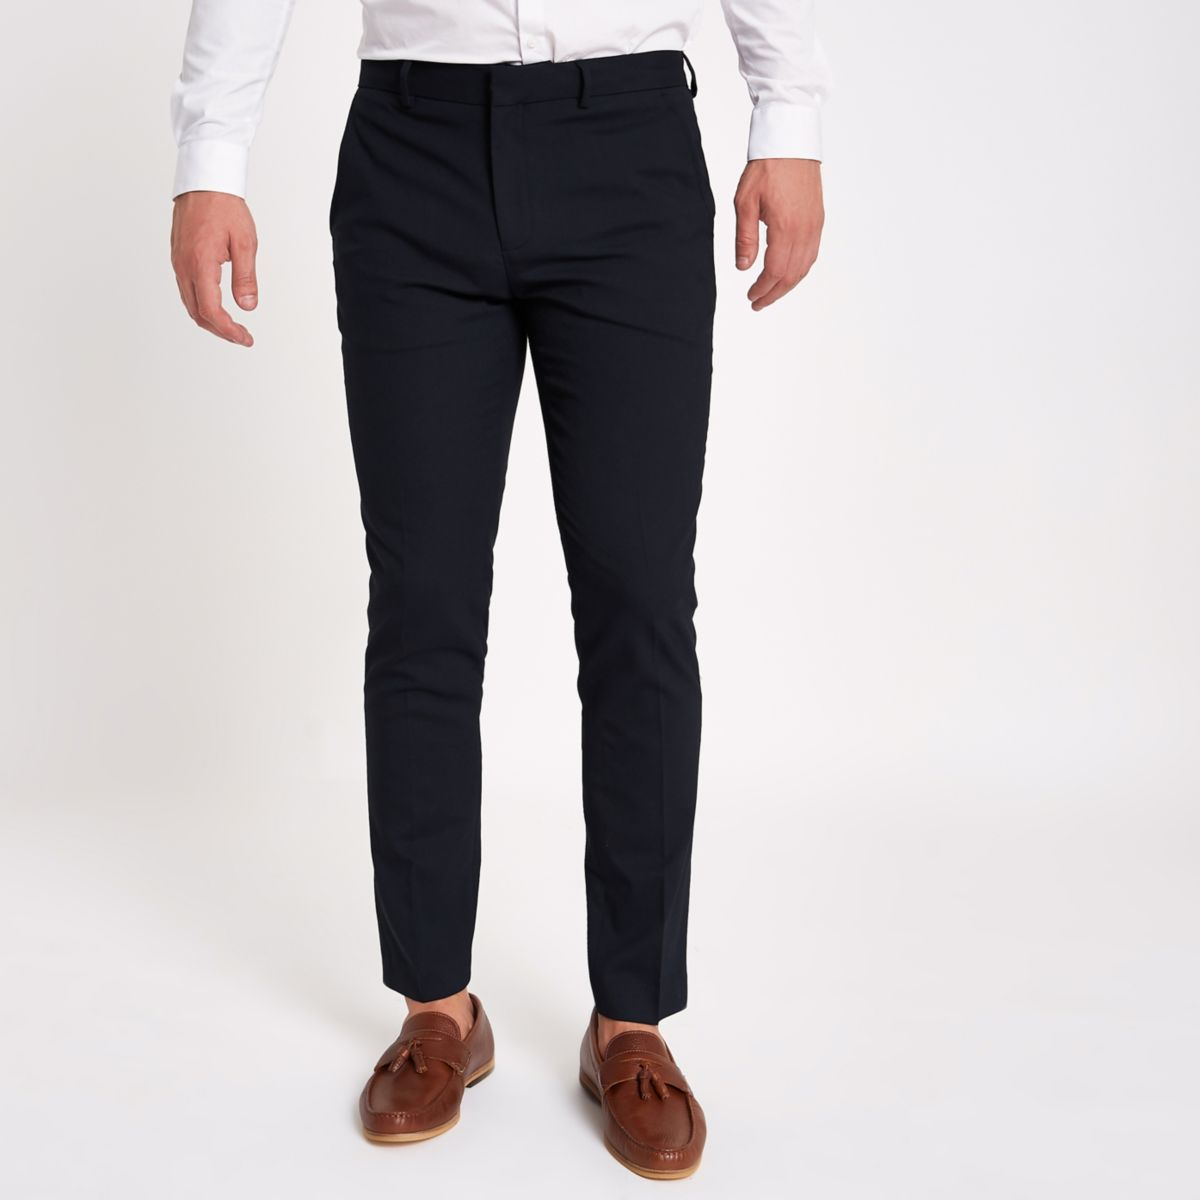 Navy skinny fit smart pants